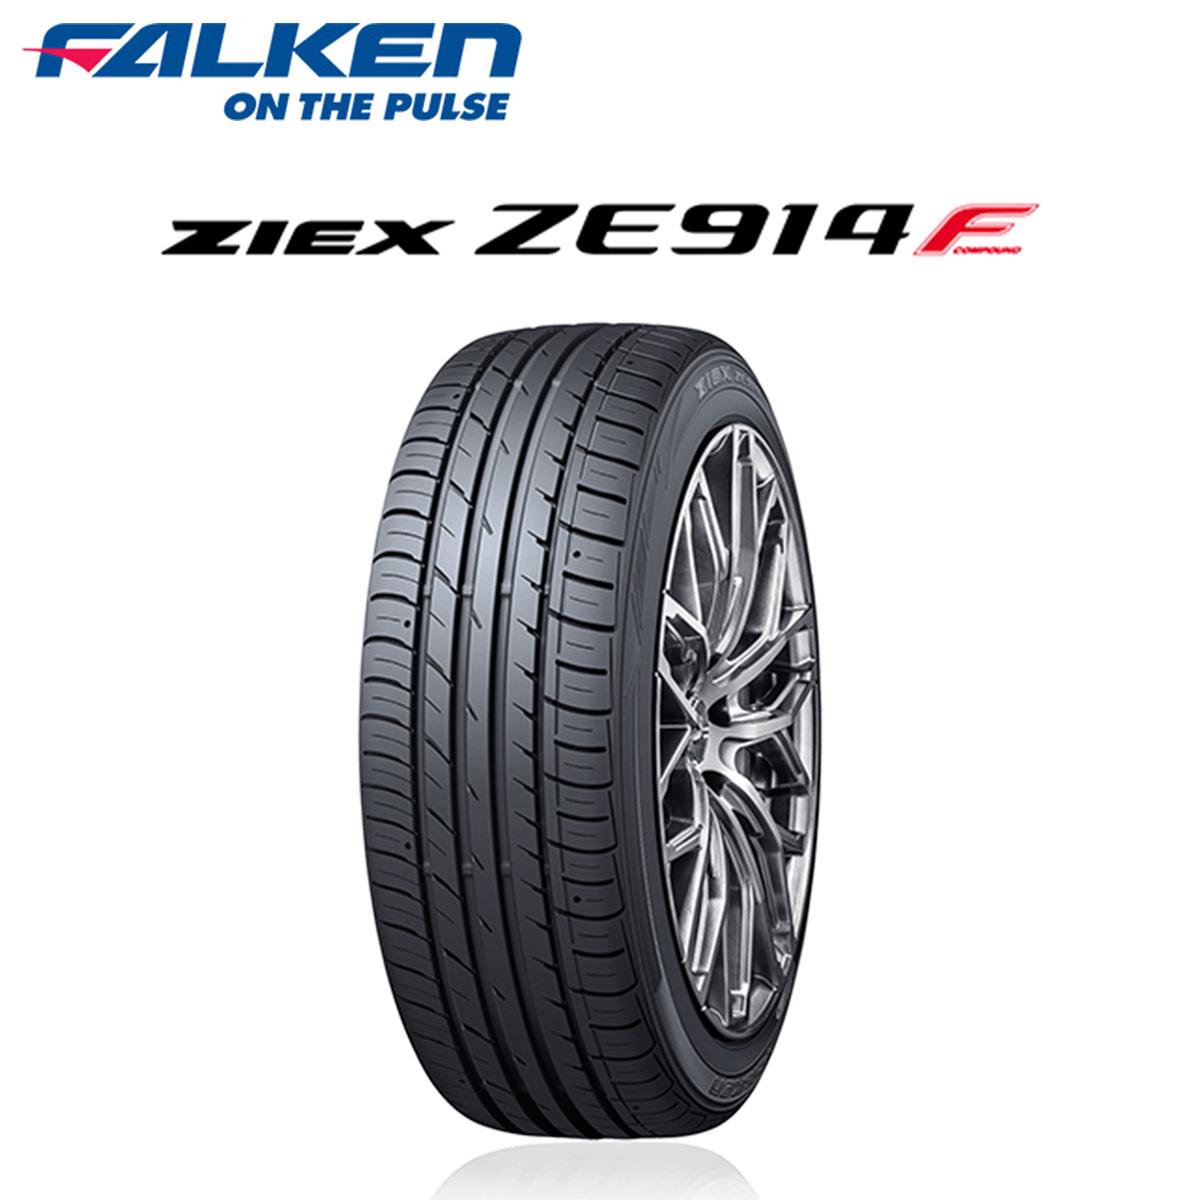 FALKEN ファルケン 低燃費 サマータイヤ 4本 セット 17インチ 225/55R17 ZIEX ZE914F ジークス